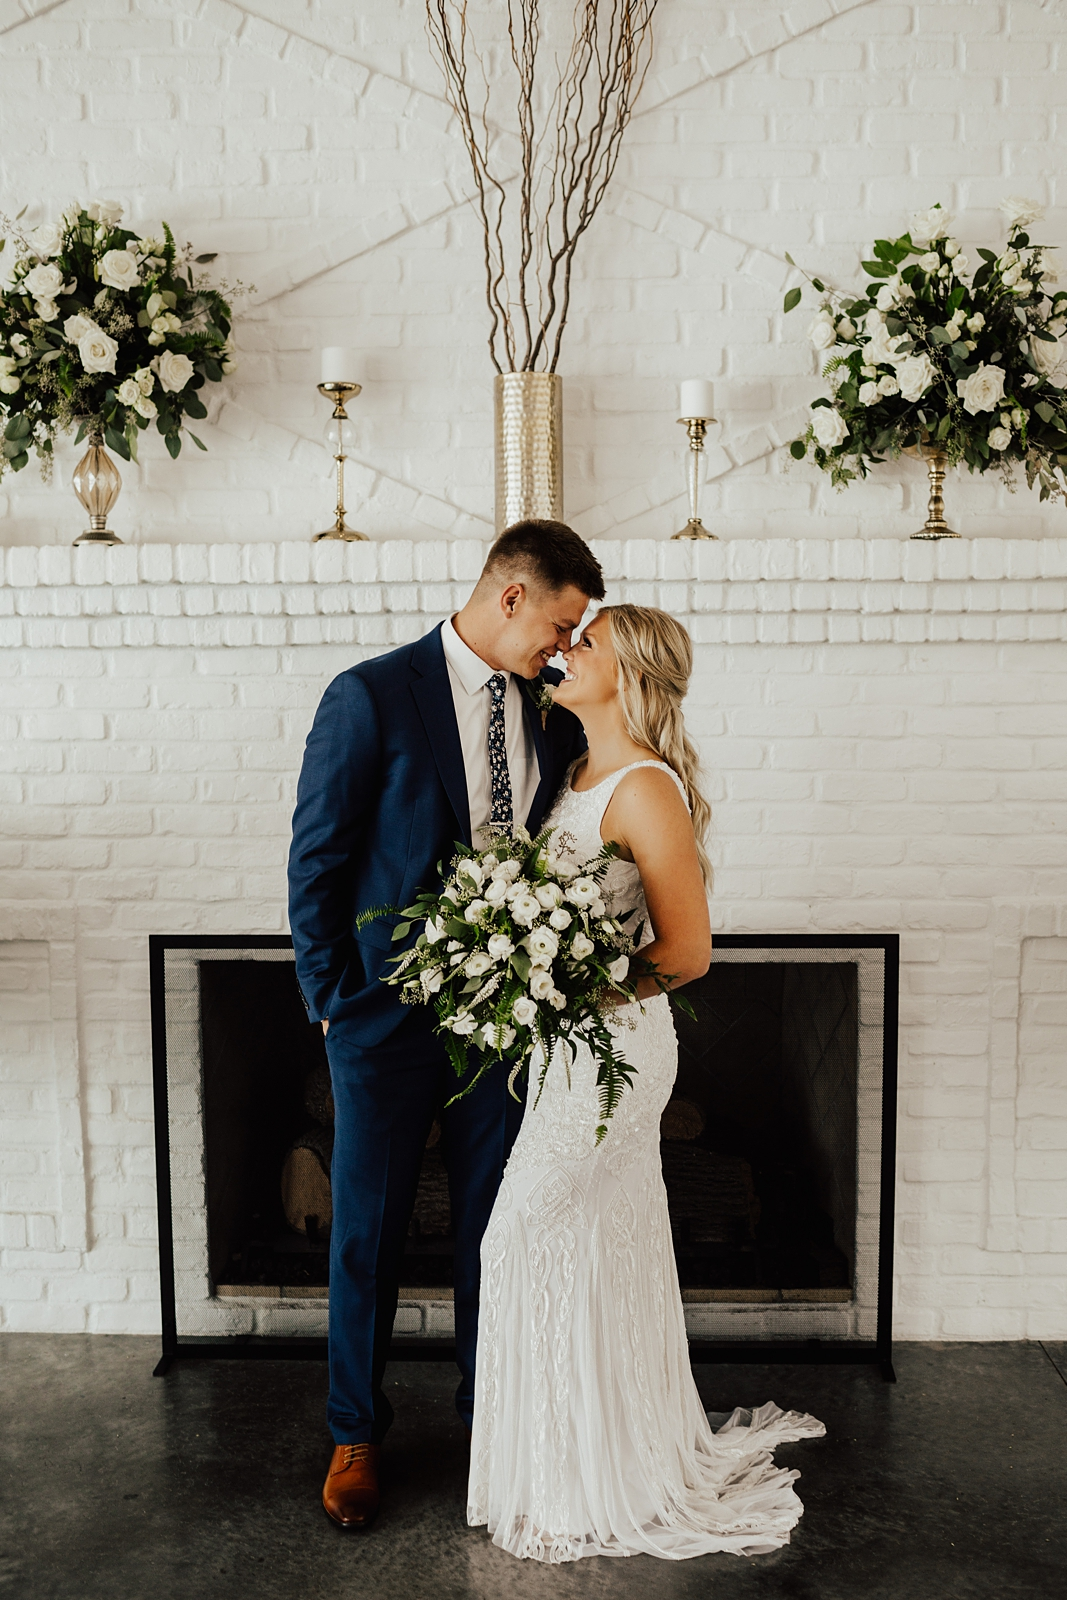 Anna & Trey Modern Minneapolis Wedding at The Hutton House_0699.jpg